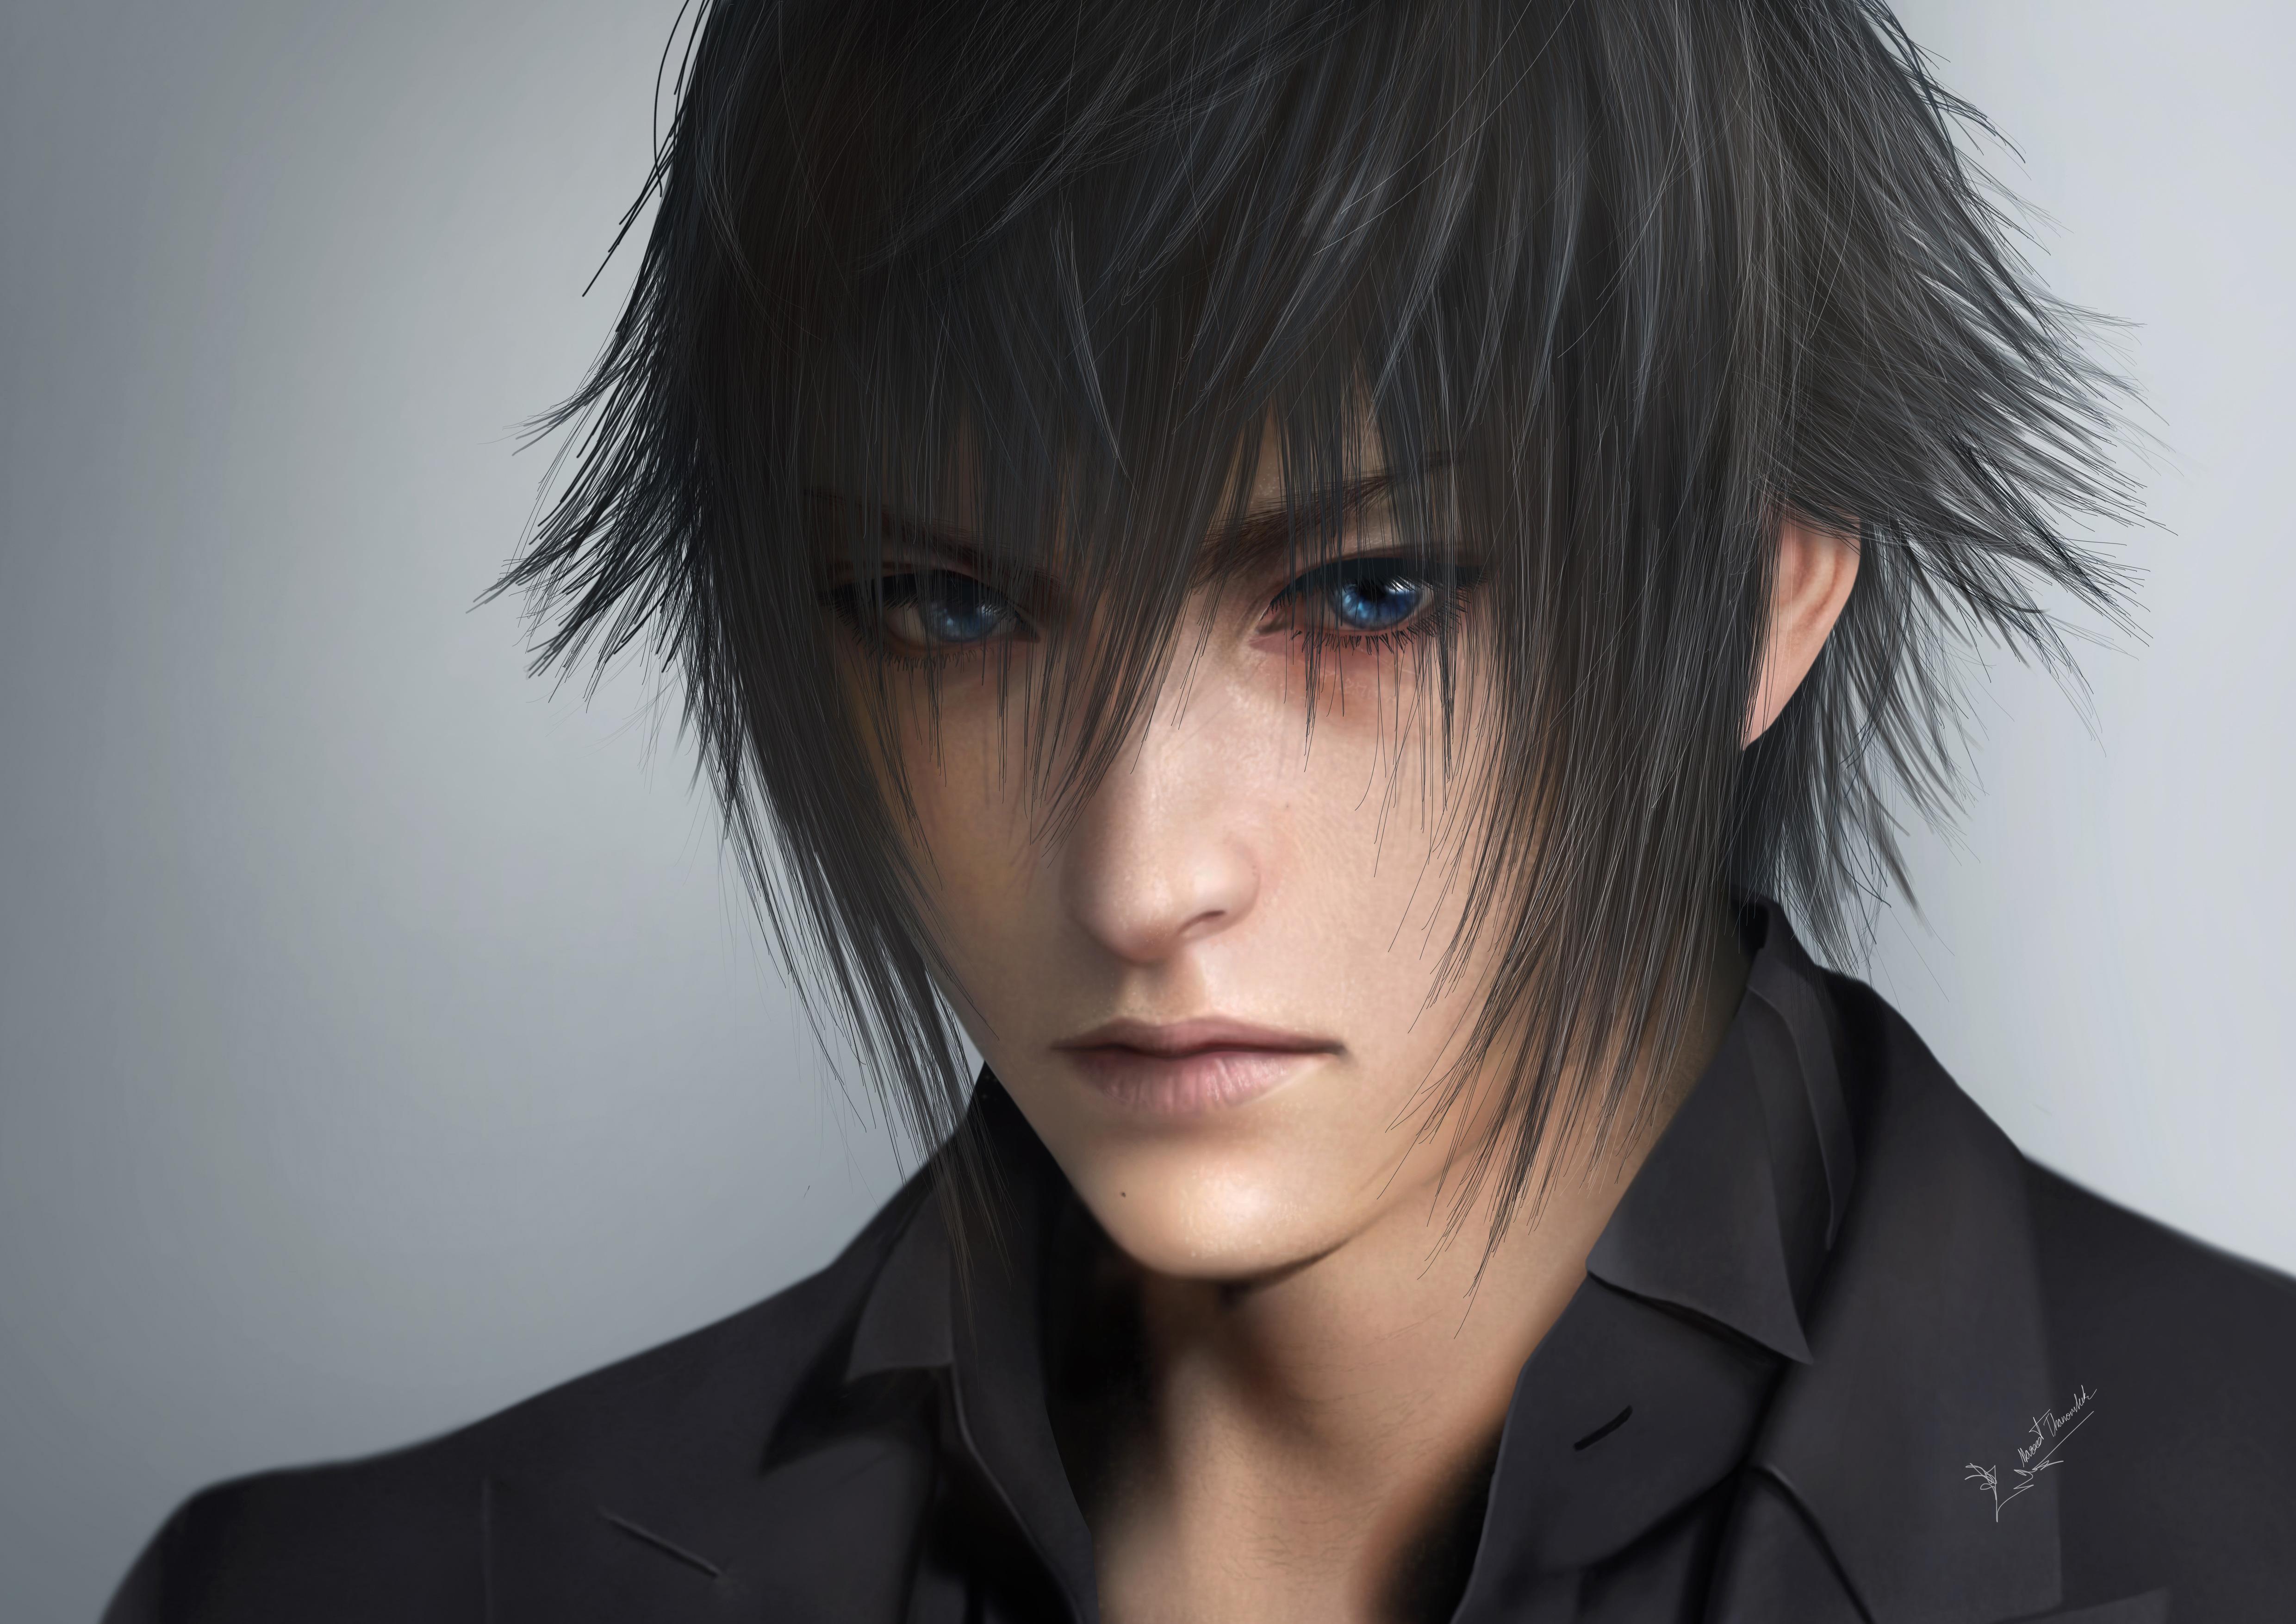 4k Noctis Lucis Caelum Final Fantasy Xv Hd Games 4k: Ffxv Prince Noctis Lucis Caelum Artwork 5k, HD Games, 4k